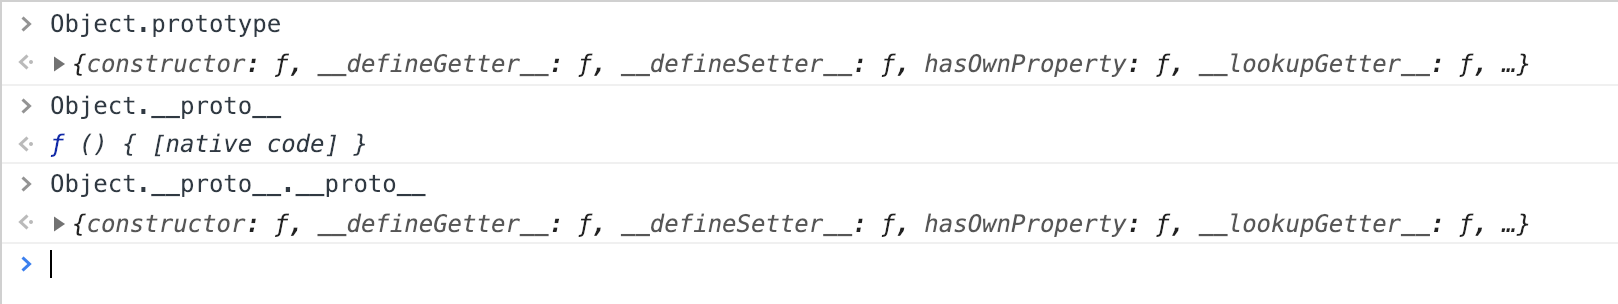 《javascript原型-终章  Obejct和Function到底是什么关系》